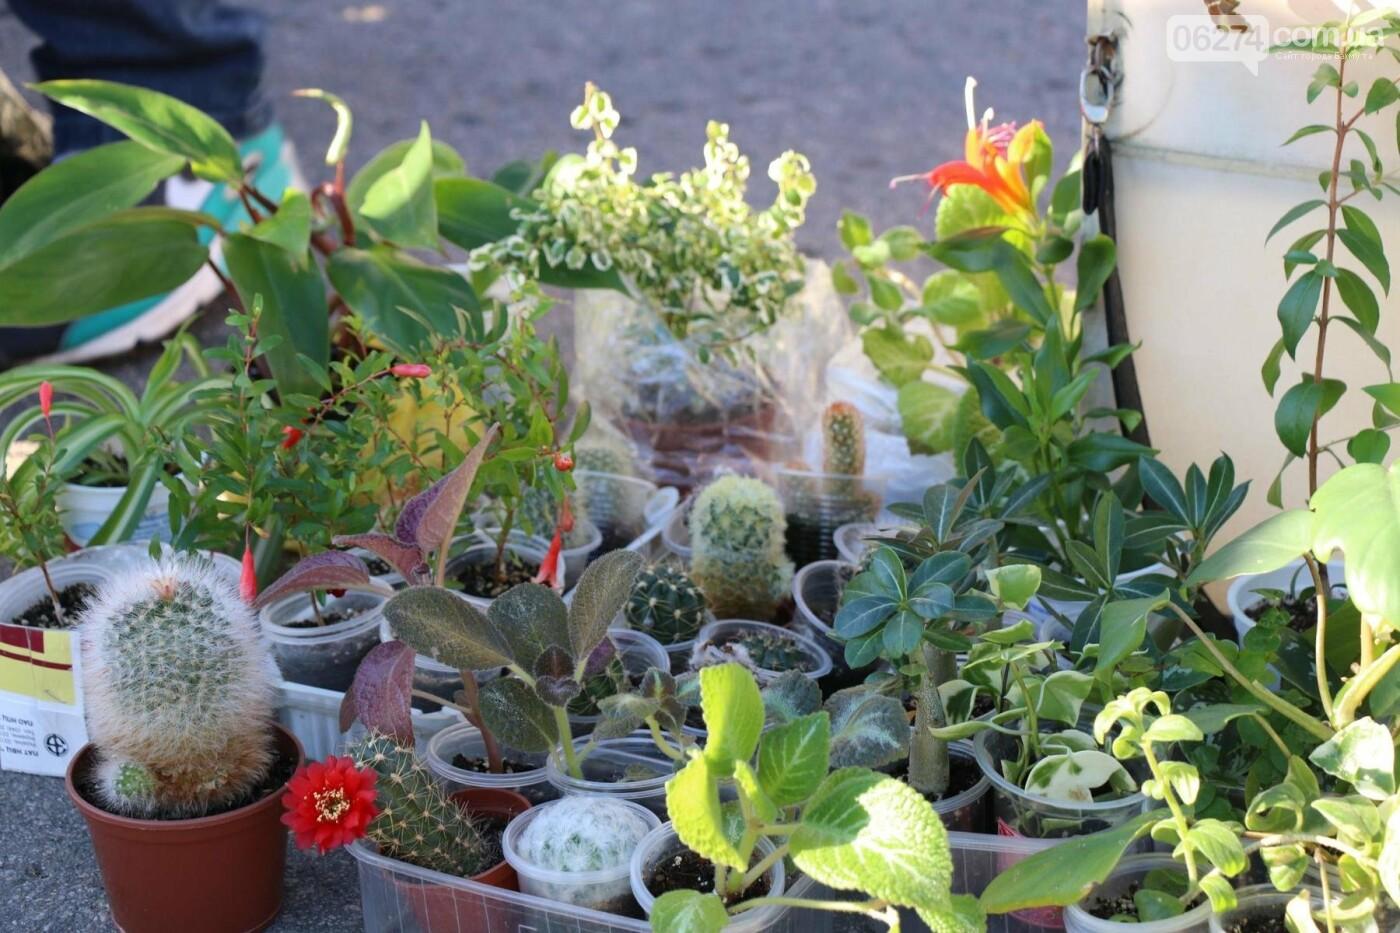 В Бахмуте прошла ярмарка «День садовода» (ФОТО), фото-3